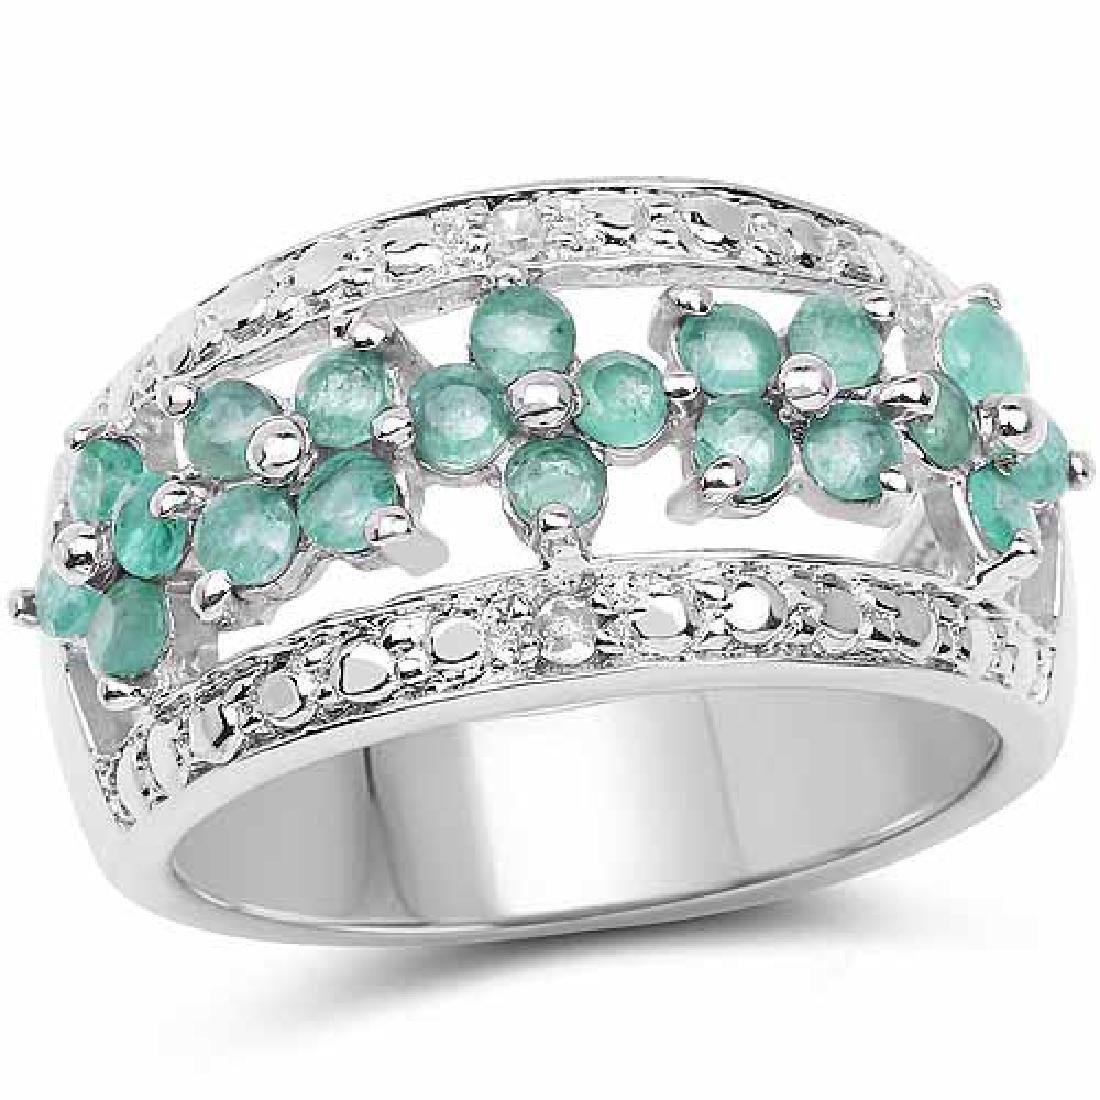 0.62 Carat Genuine Emerald and White Diamond .925 Sterl